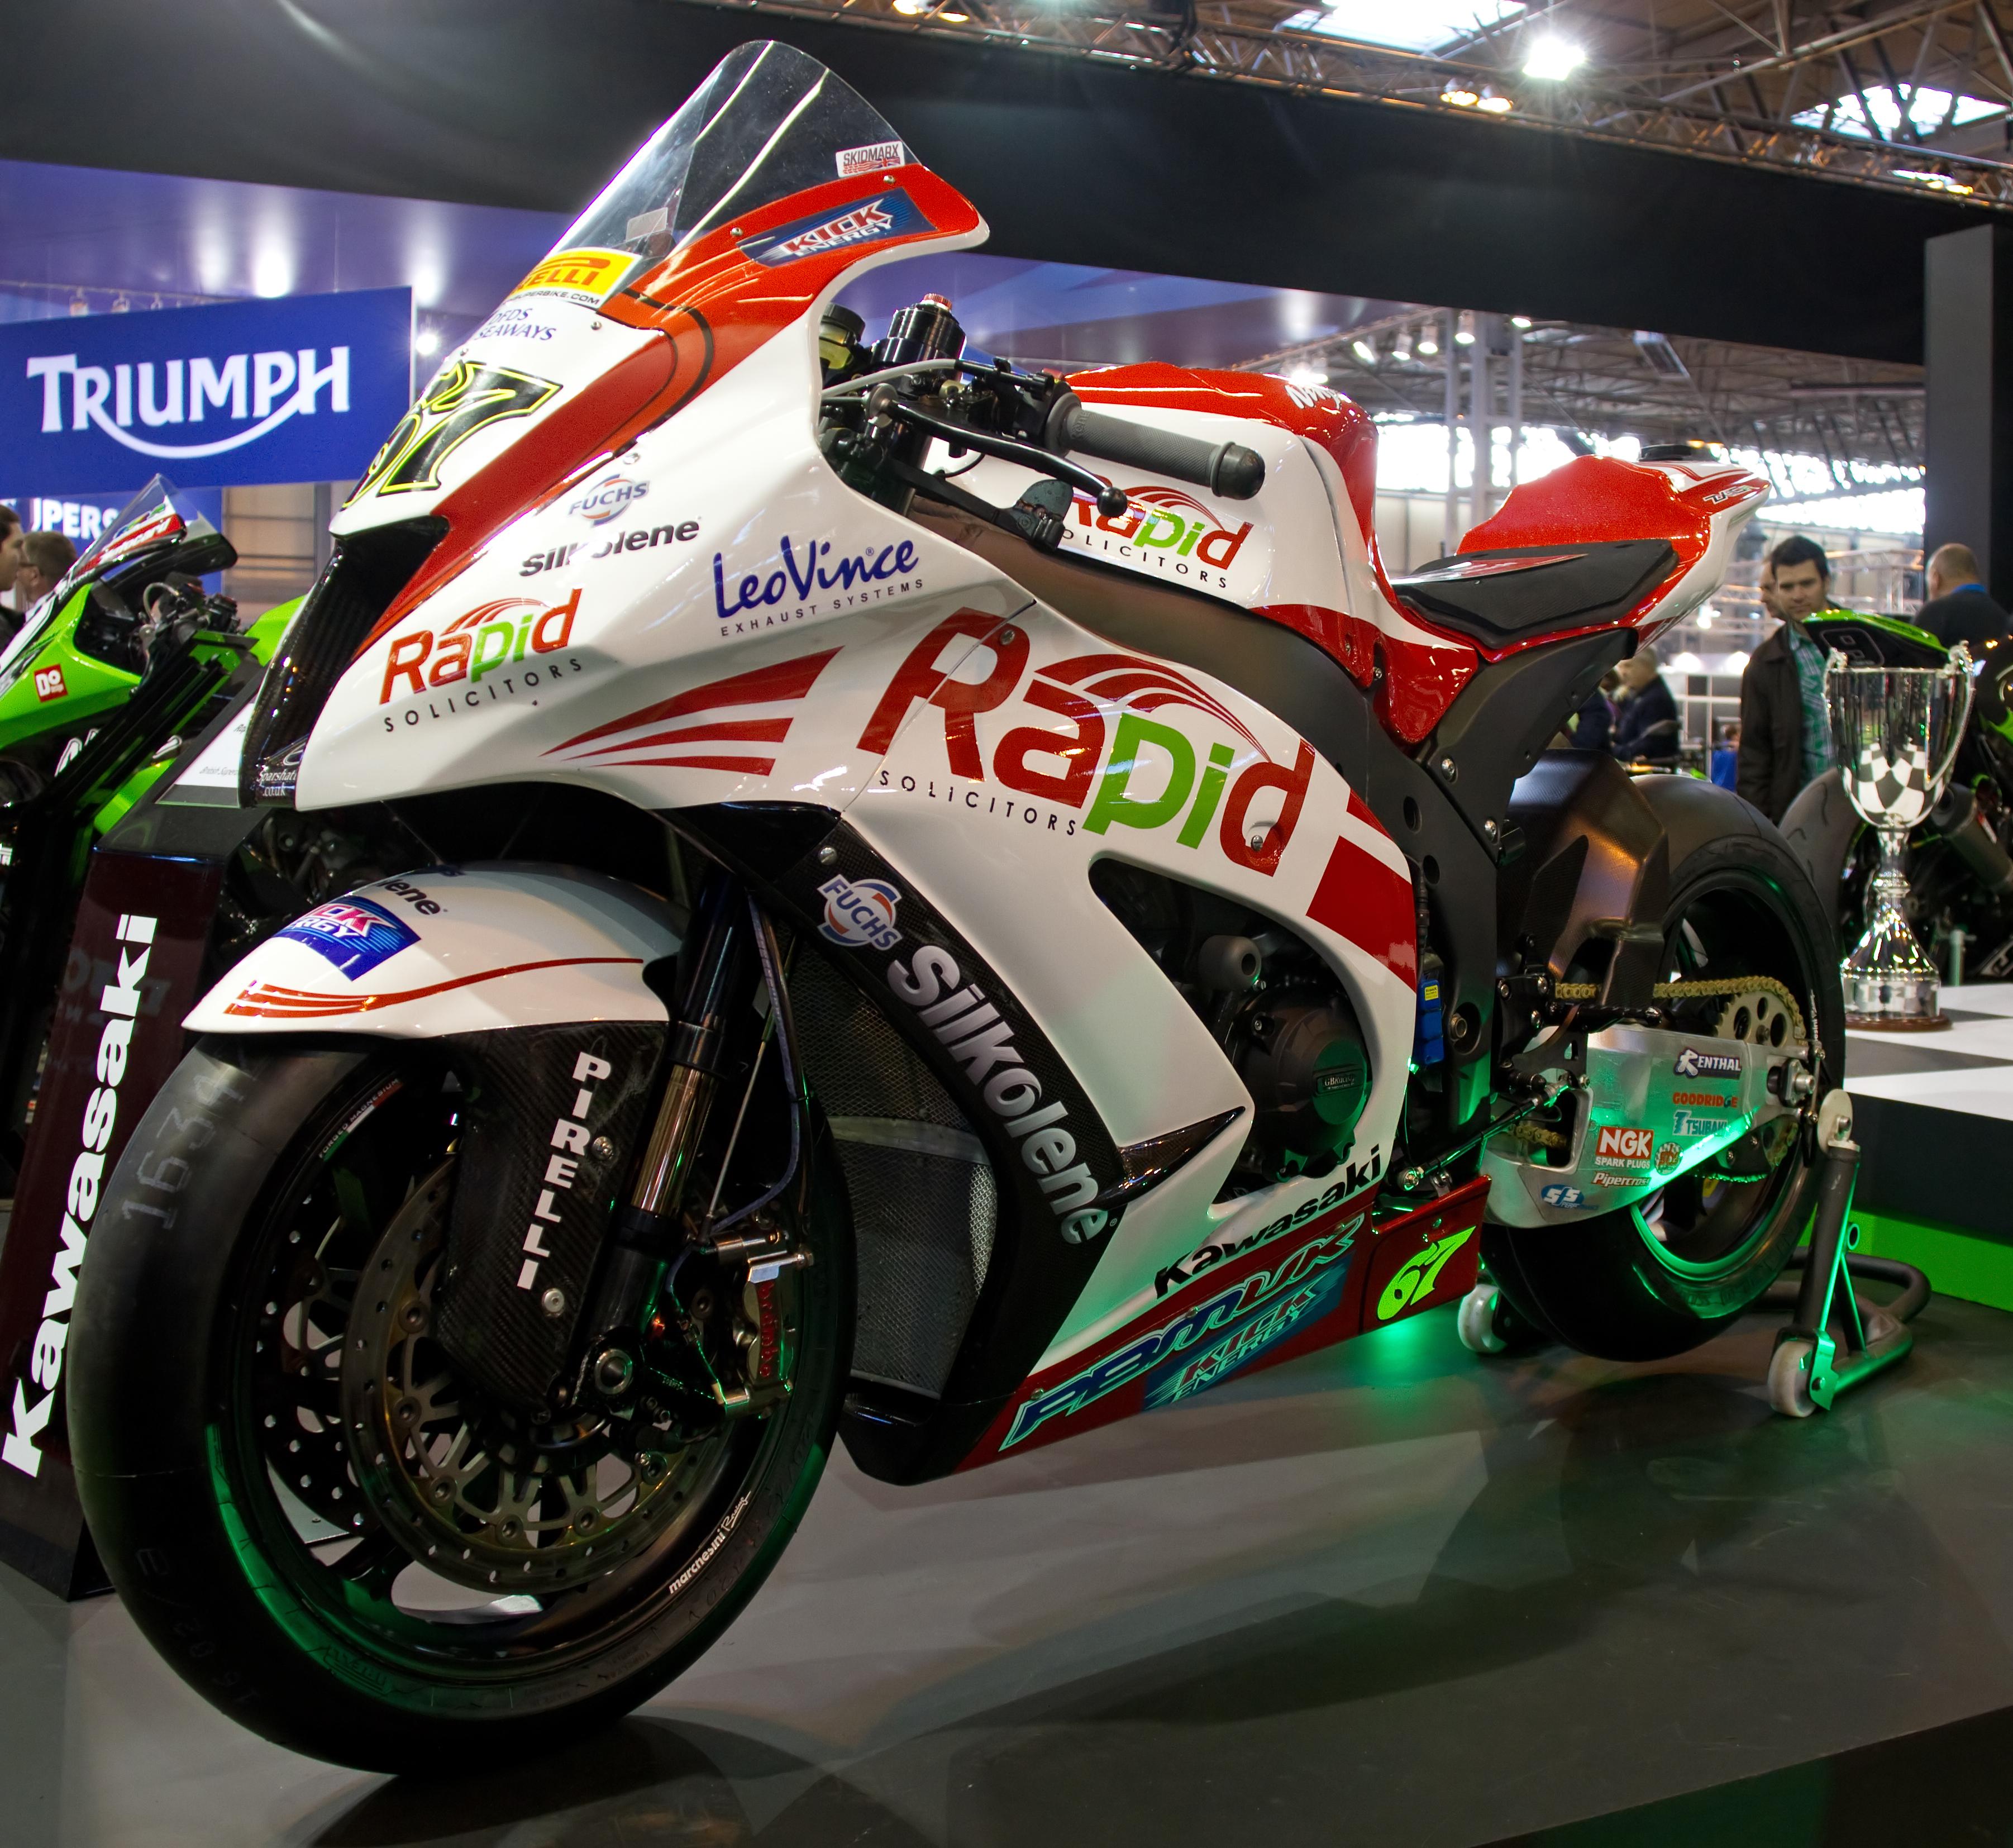 Nhung bo ao sac so cho Kawasaki ZX10R - 3